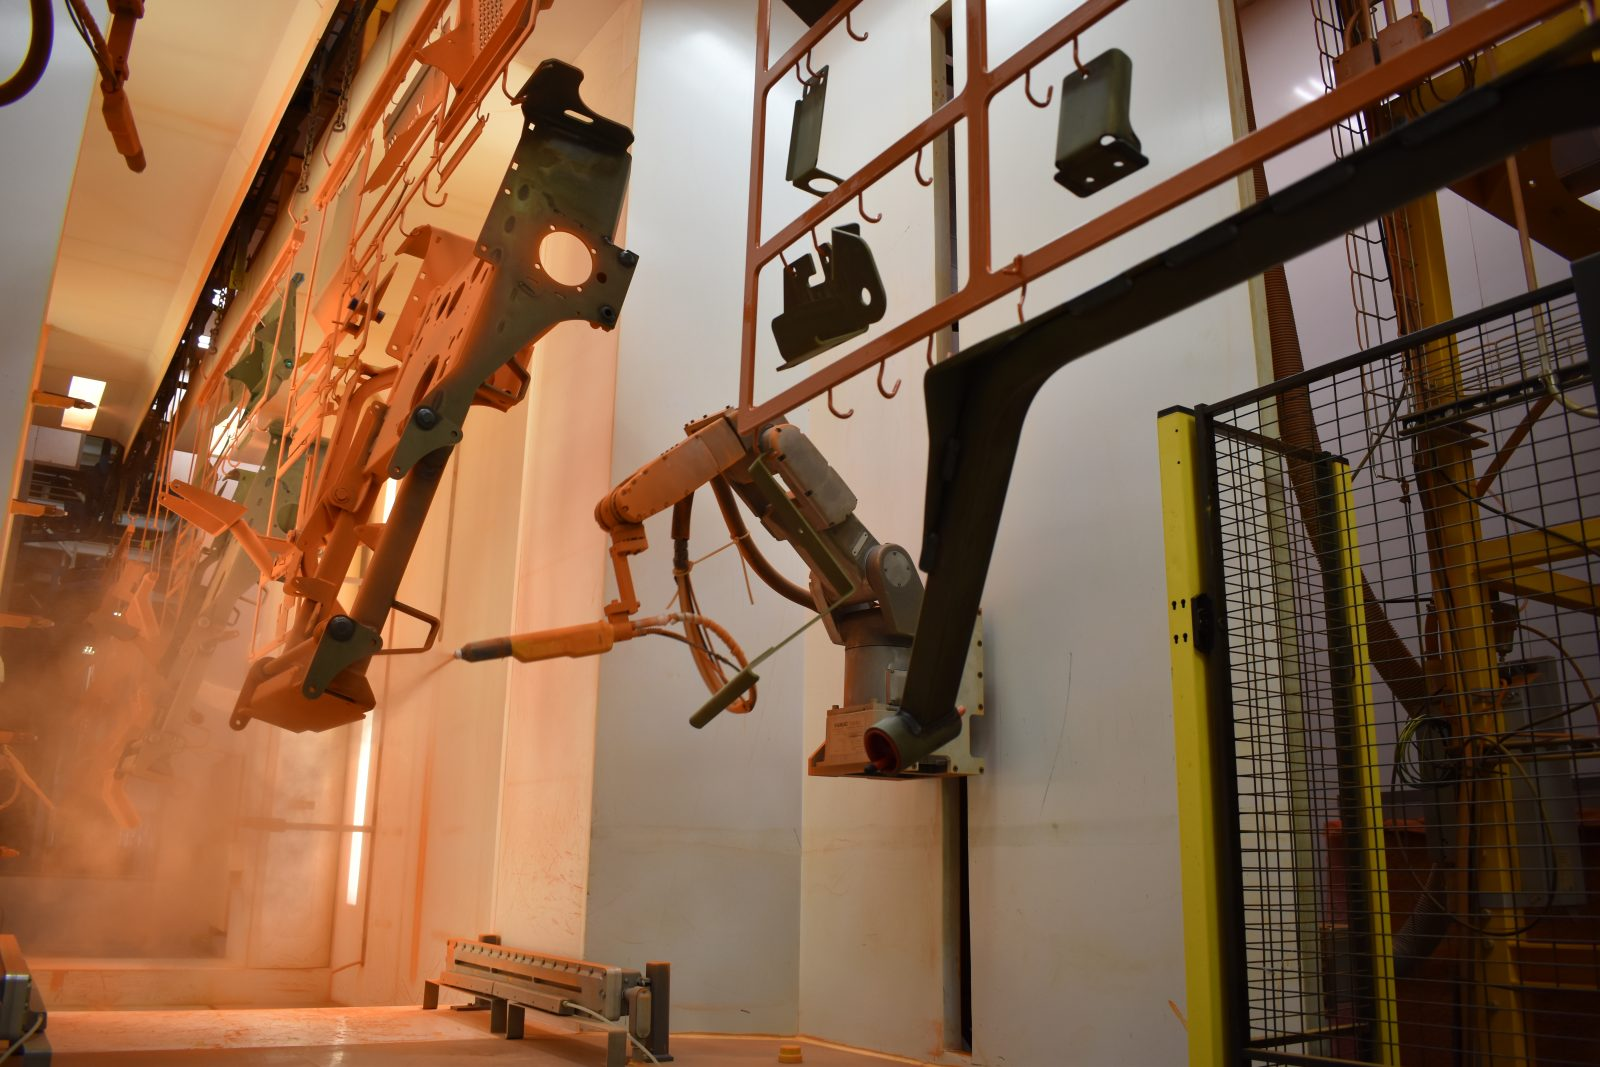 FANUC Robots paint Metalcraft Scag mowers, programmed by high school grad